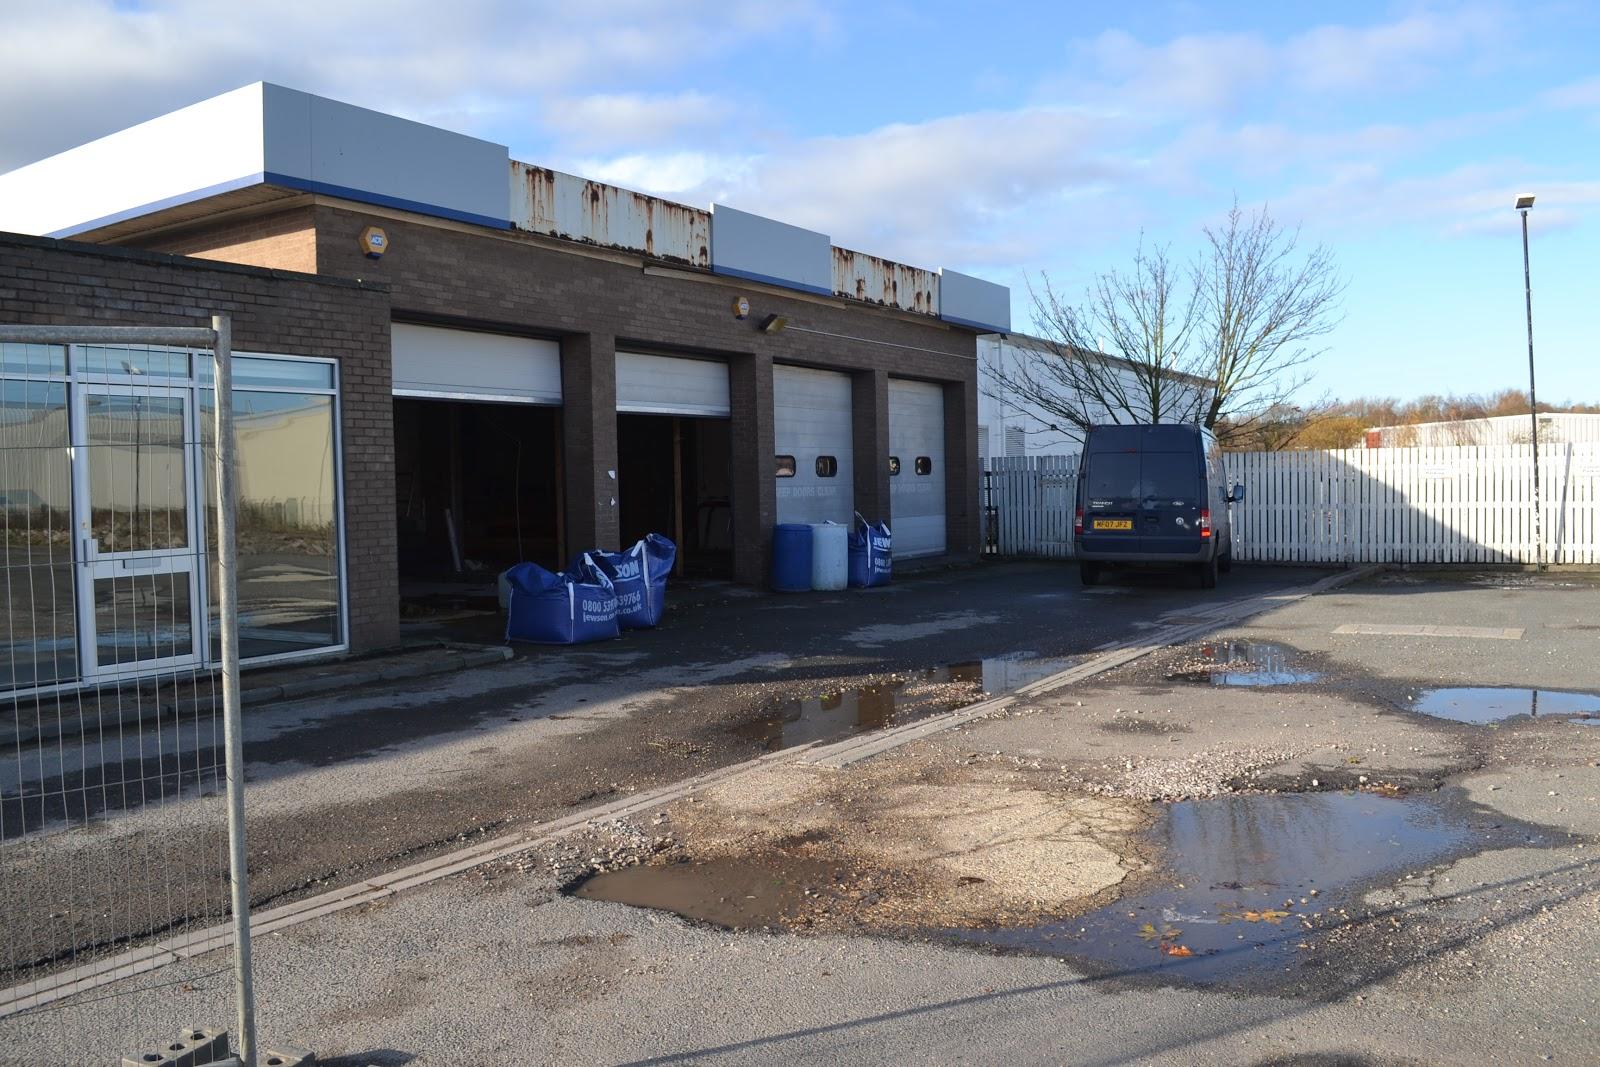 New expansion at canterbury phase 1 big motoring world - Esso garage opening times ...